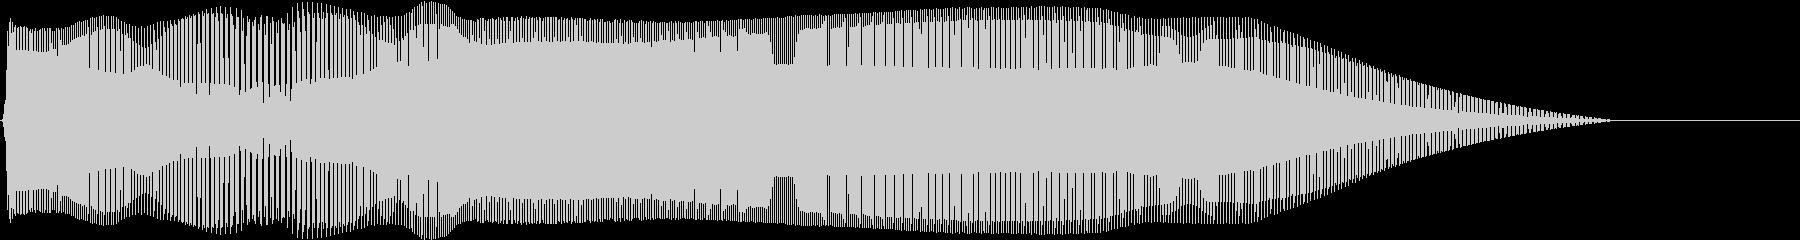 Game キャラ攻撃音 ザコキャラ退治2の未再生の波形